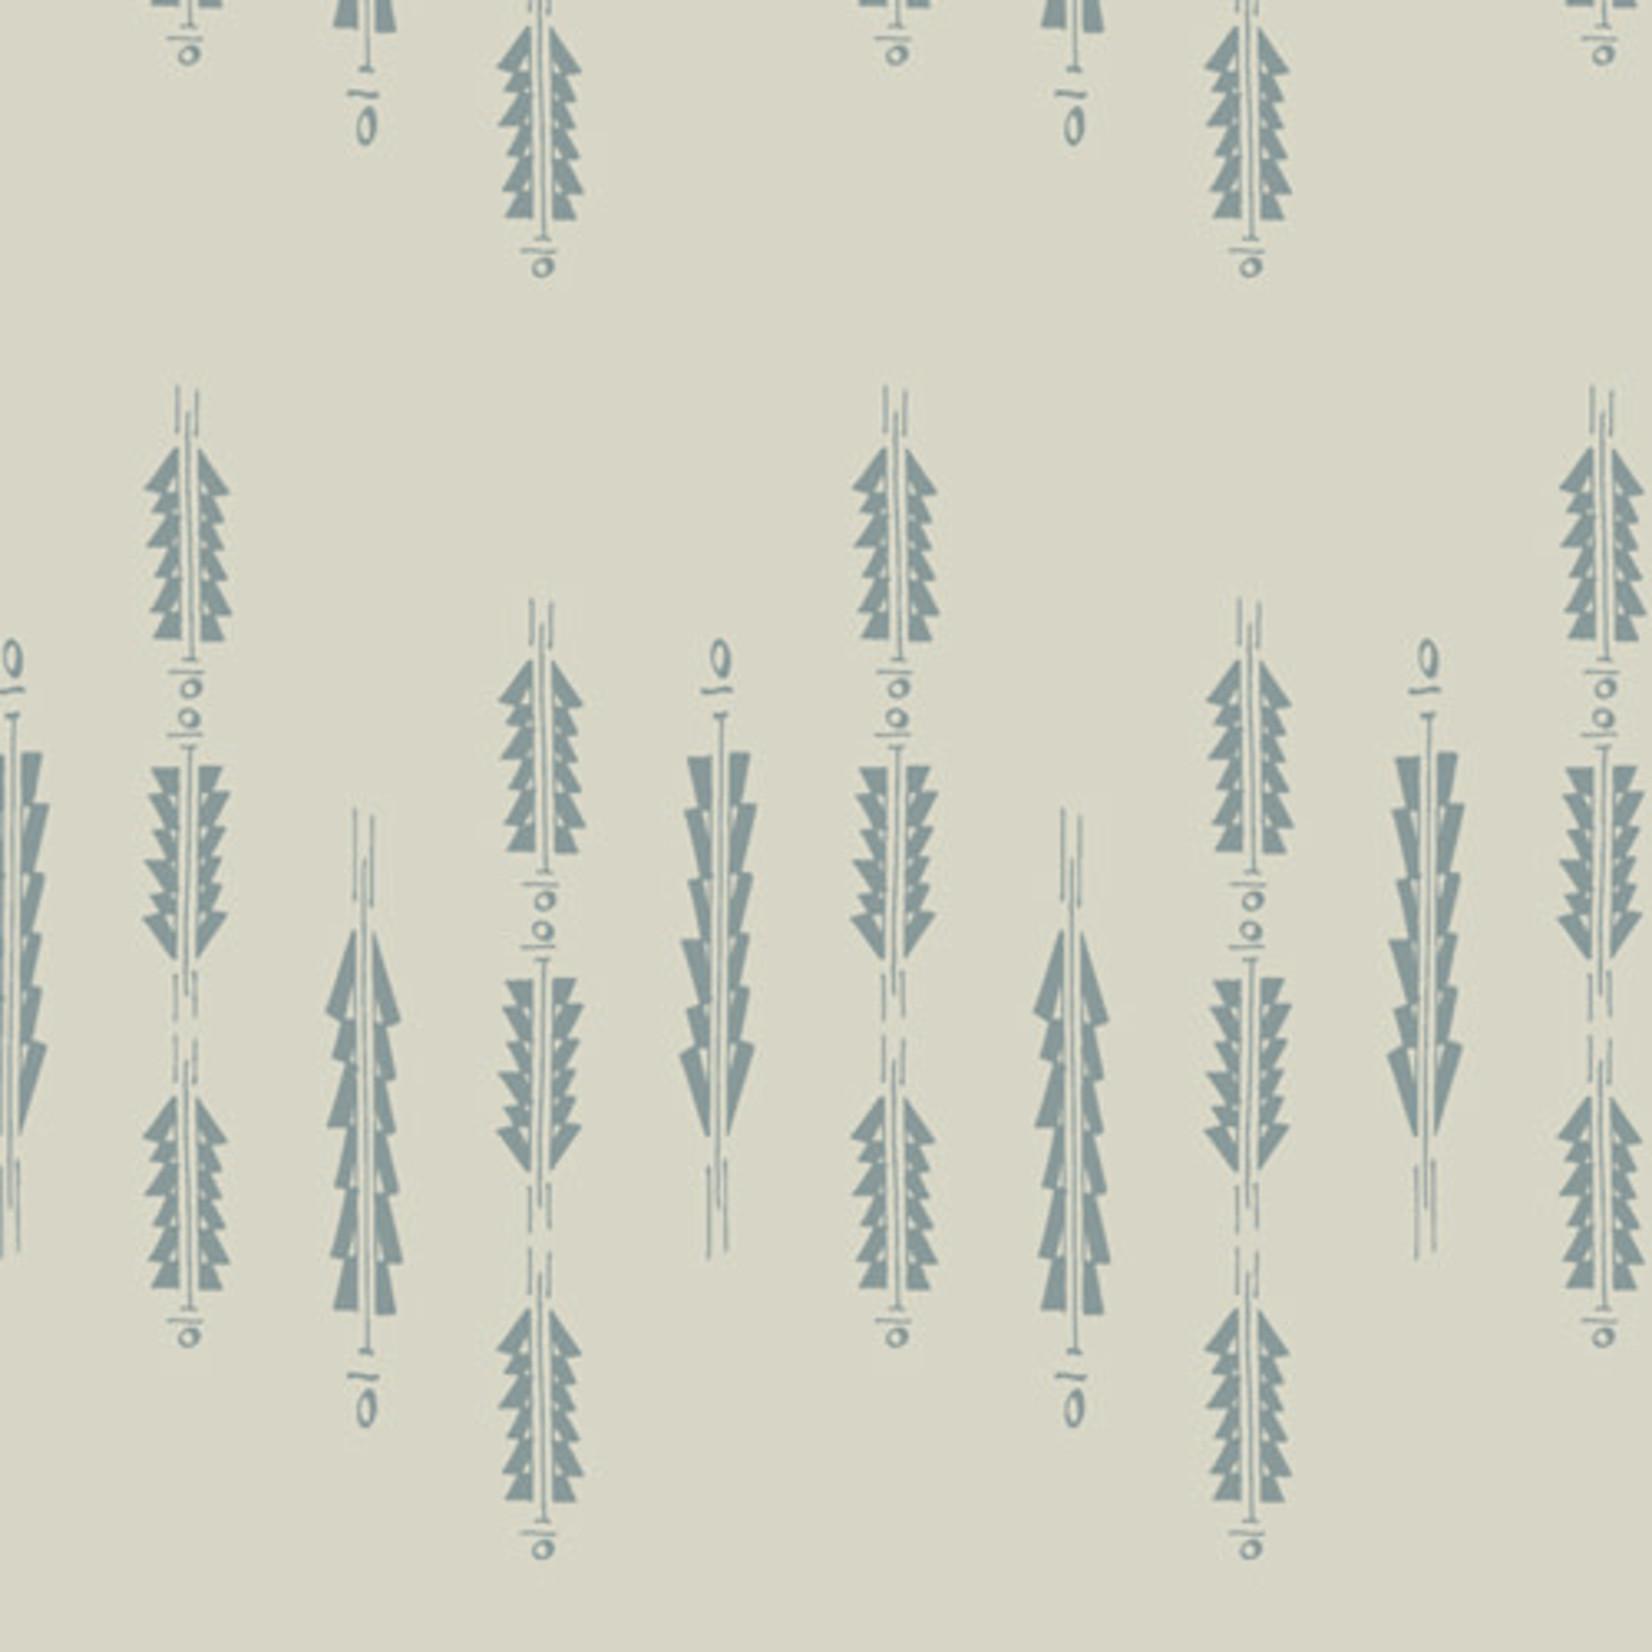 Art Gallery Serenity Fusion, Aura Fletchings Serenity (FUS-SE-2111) .20/cm or $20/m